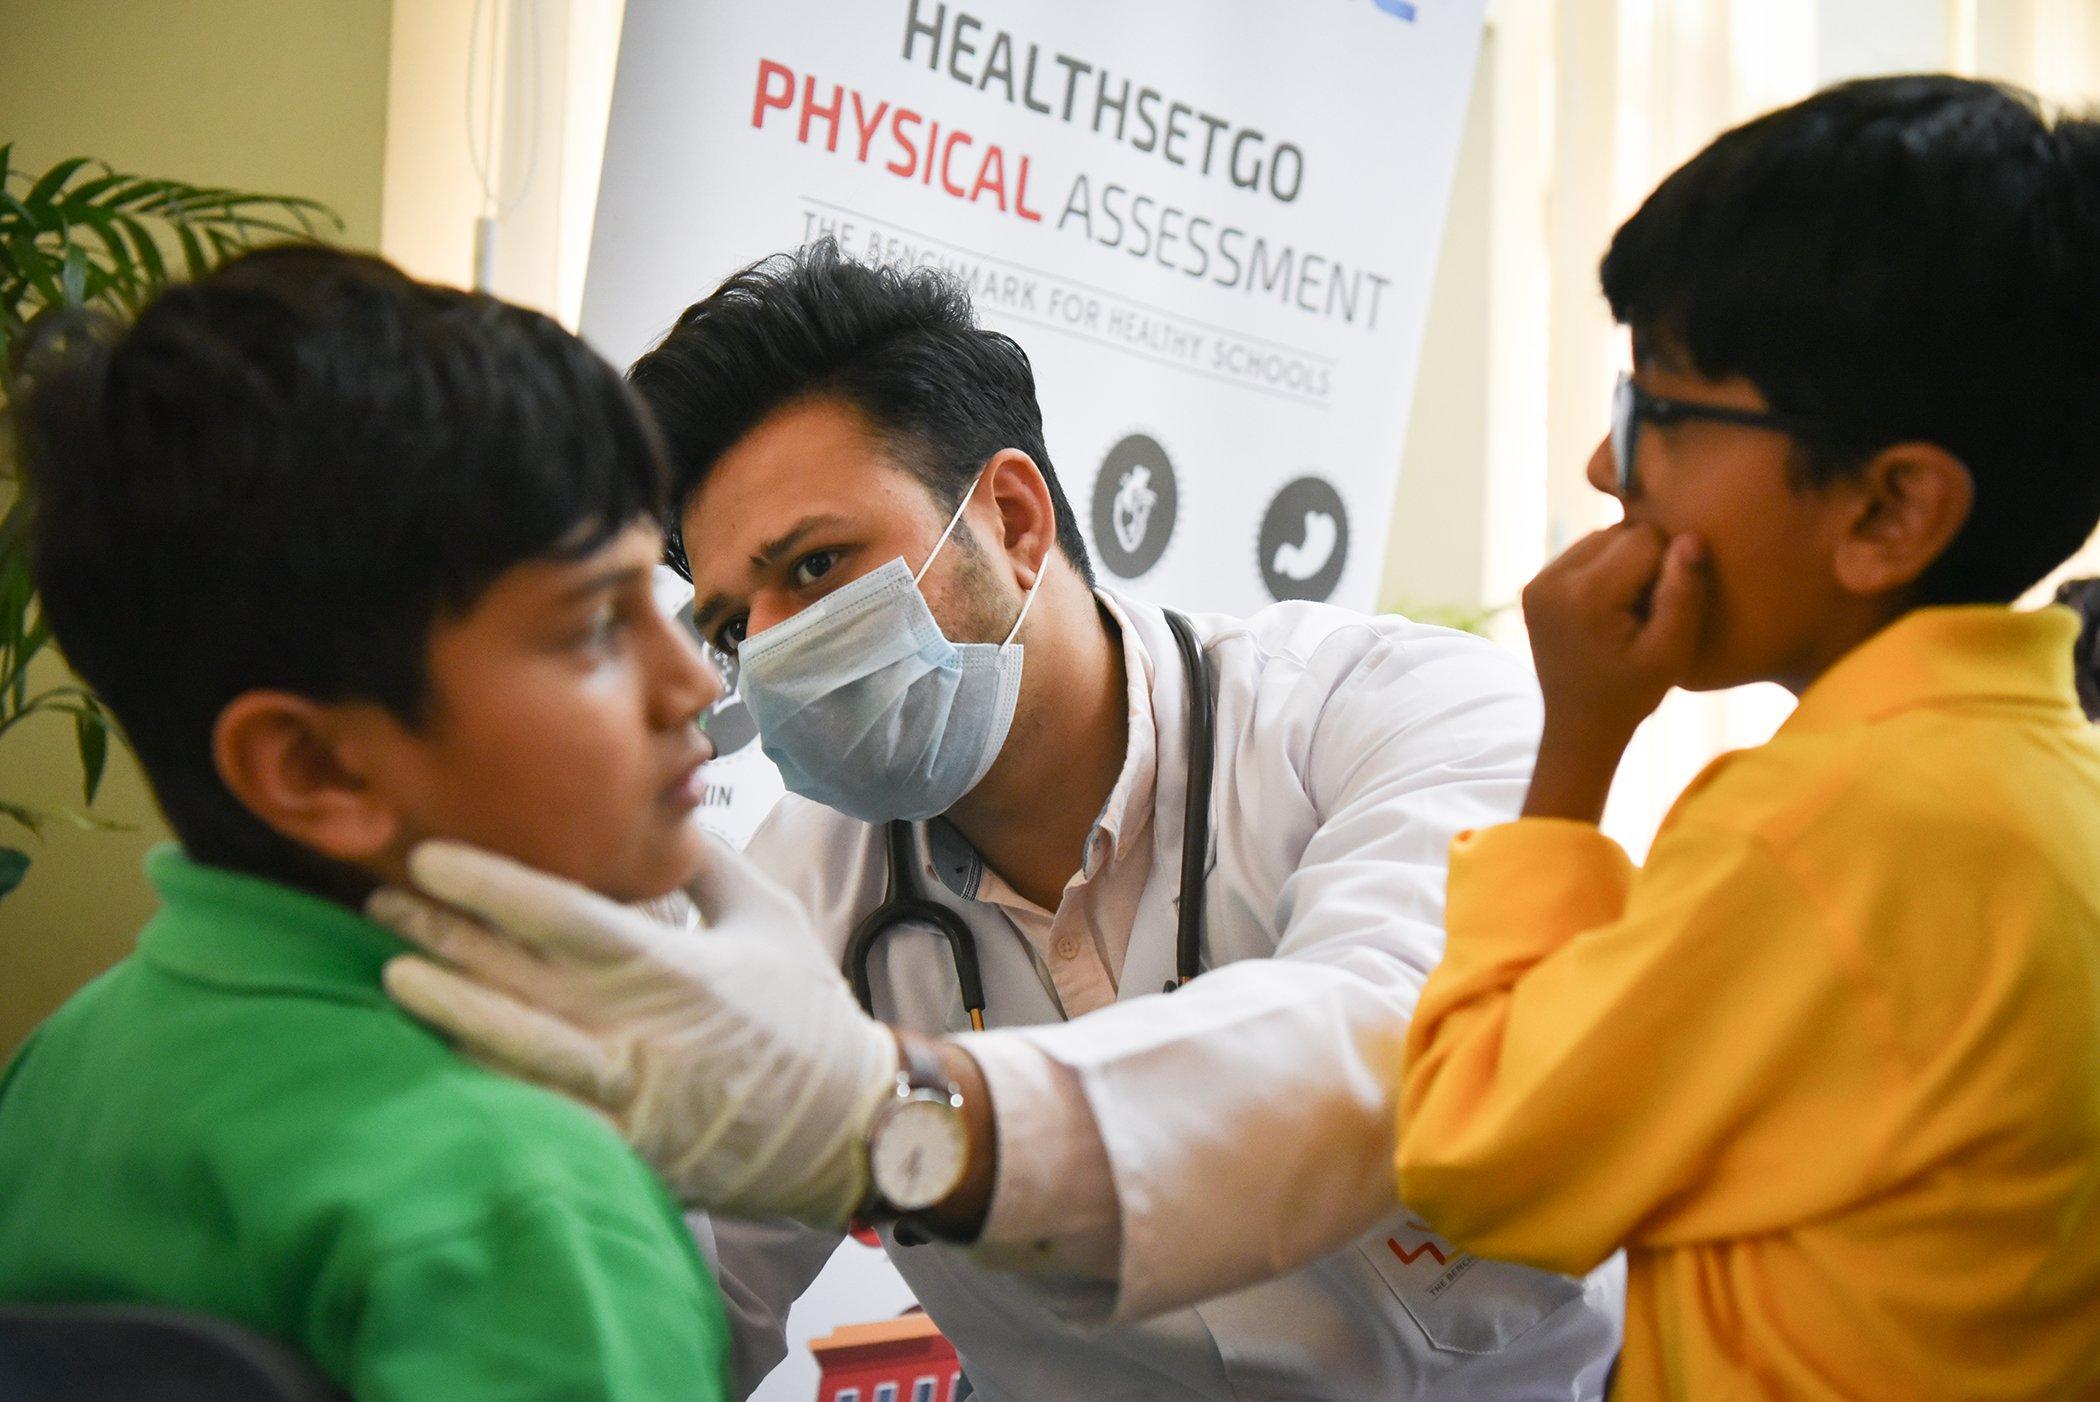 gcprize_priya_prikash_sahibachawdharyforglobalcitizen_gesundheitsvorsorge-an-schulen.jpg